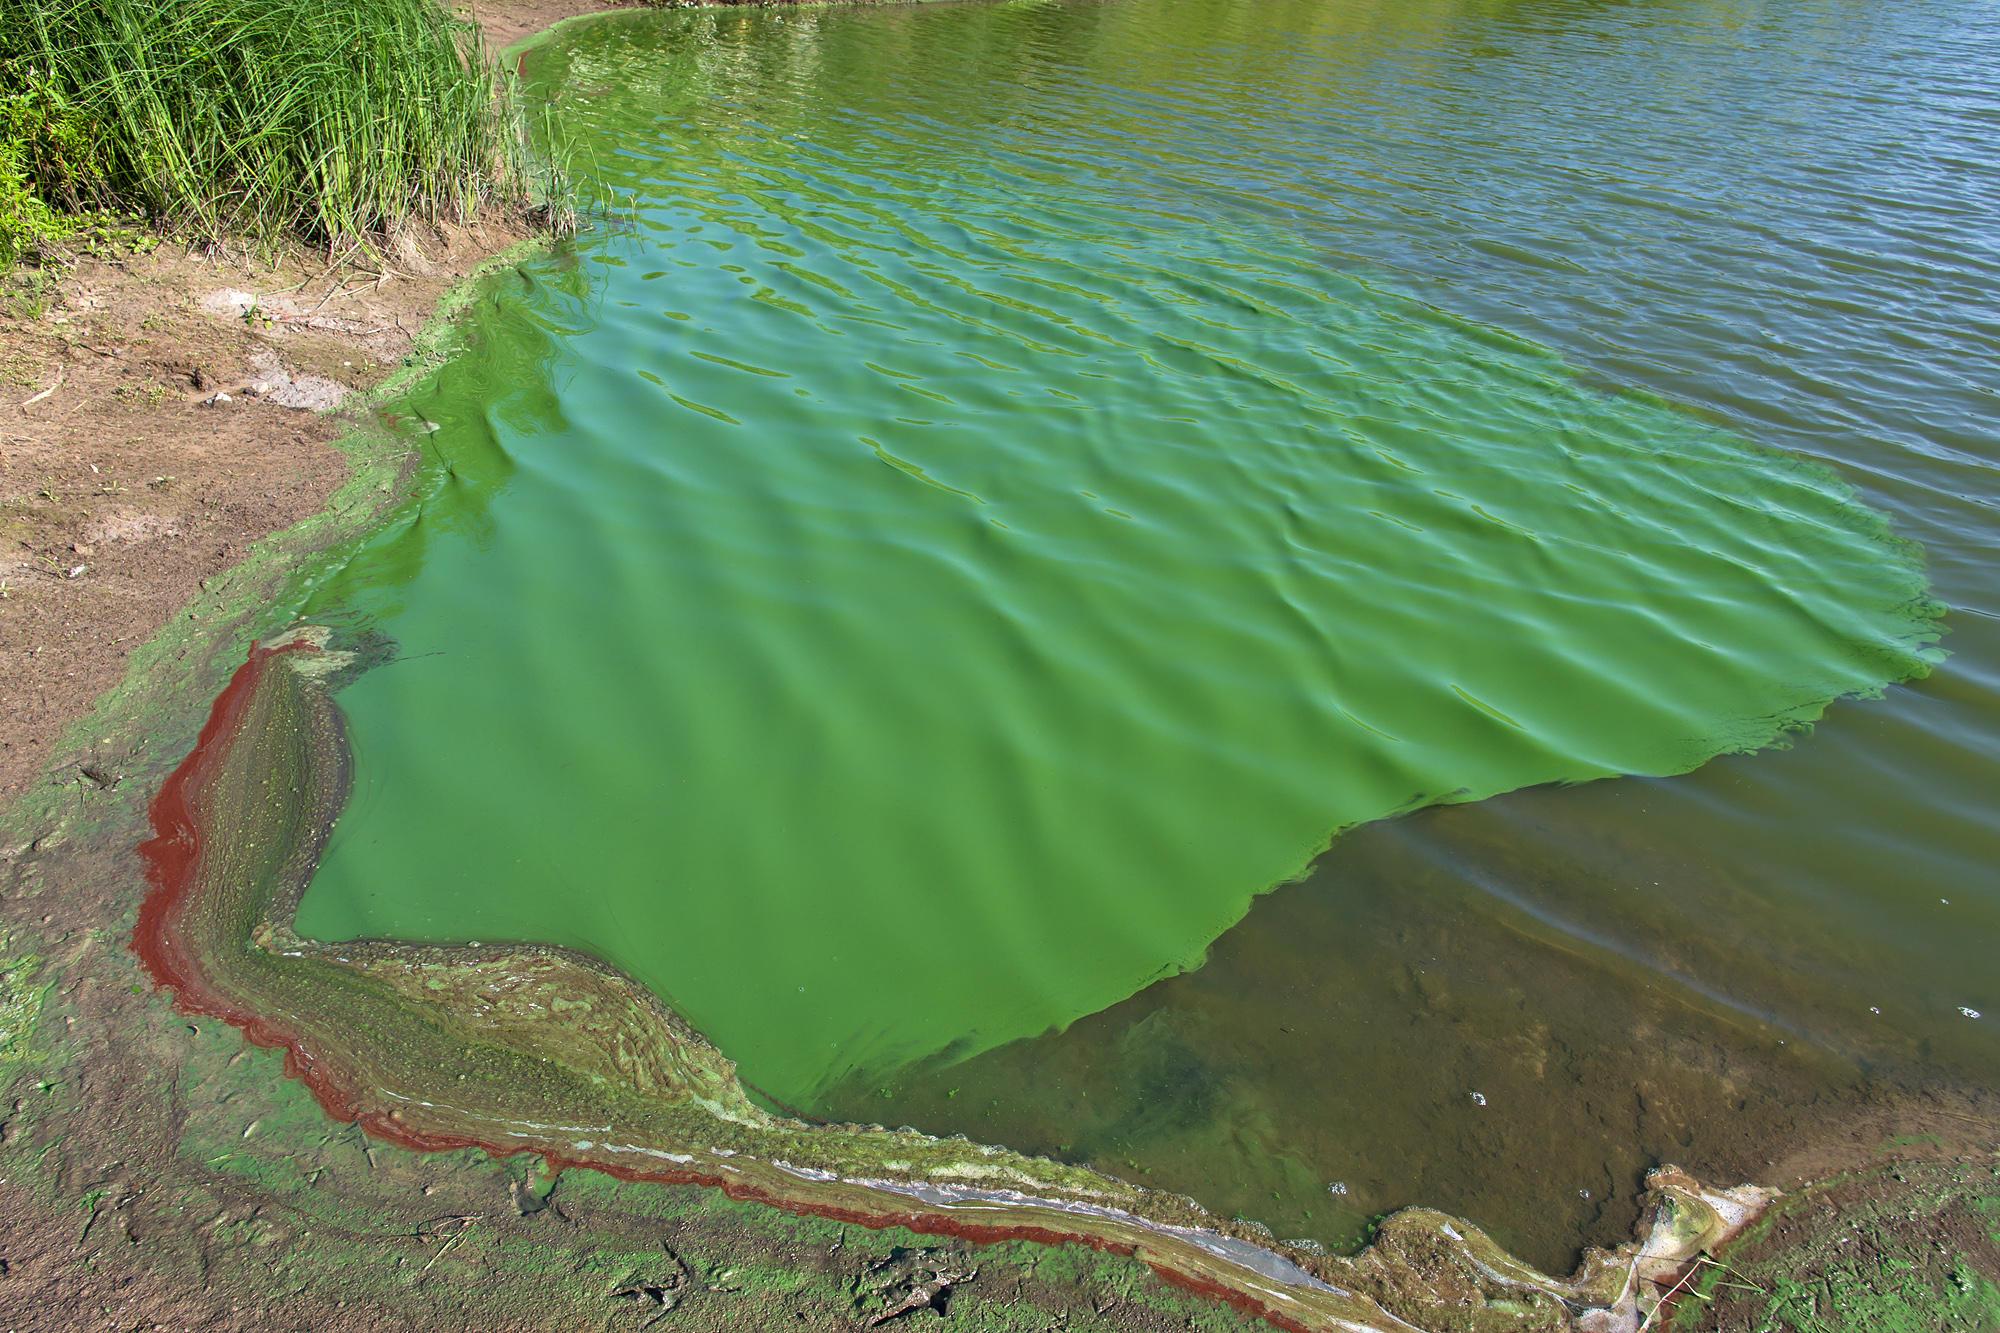 cyanobacteria algae